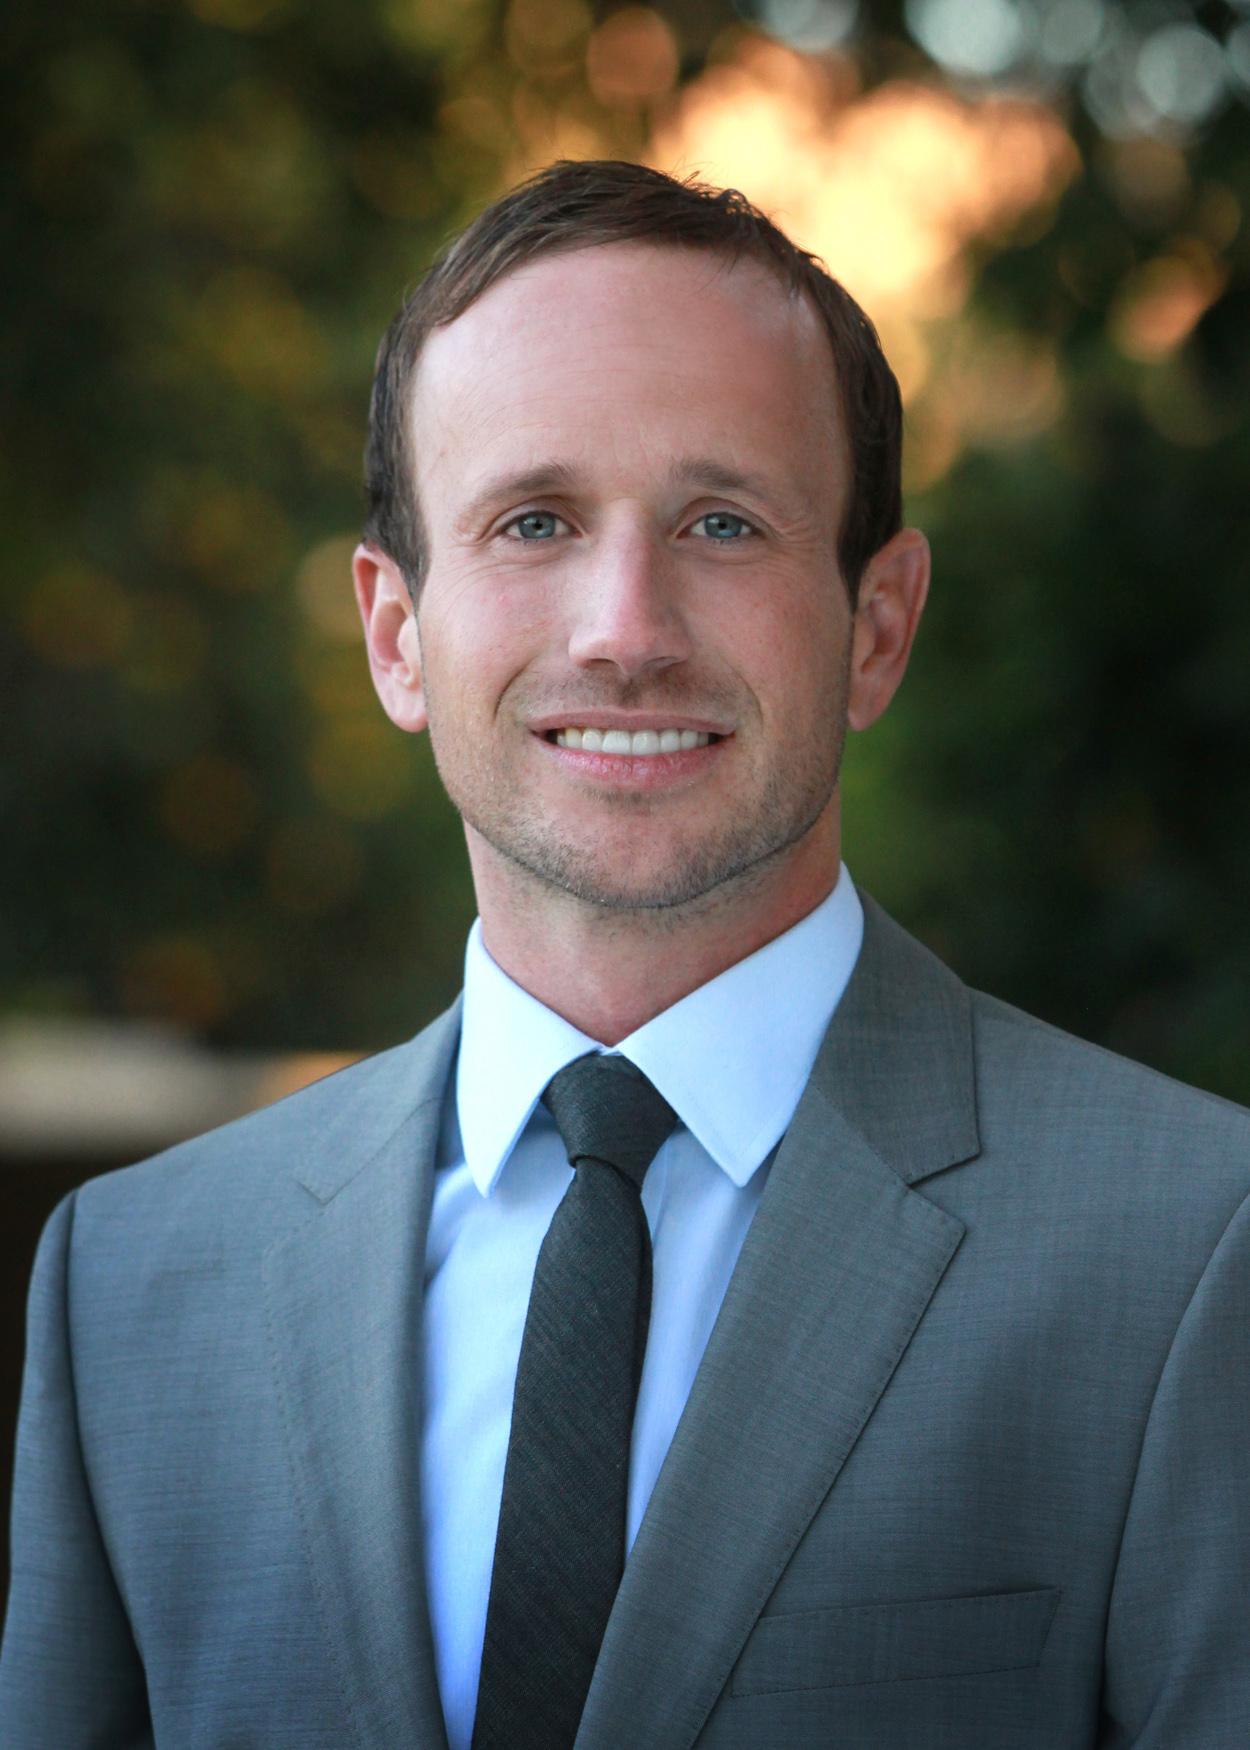 Dr. Daniel J. Gibbons